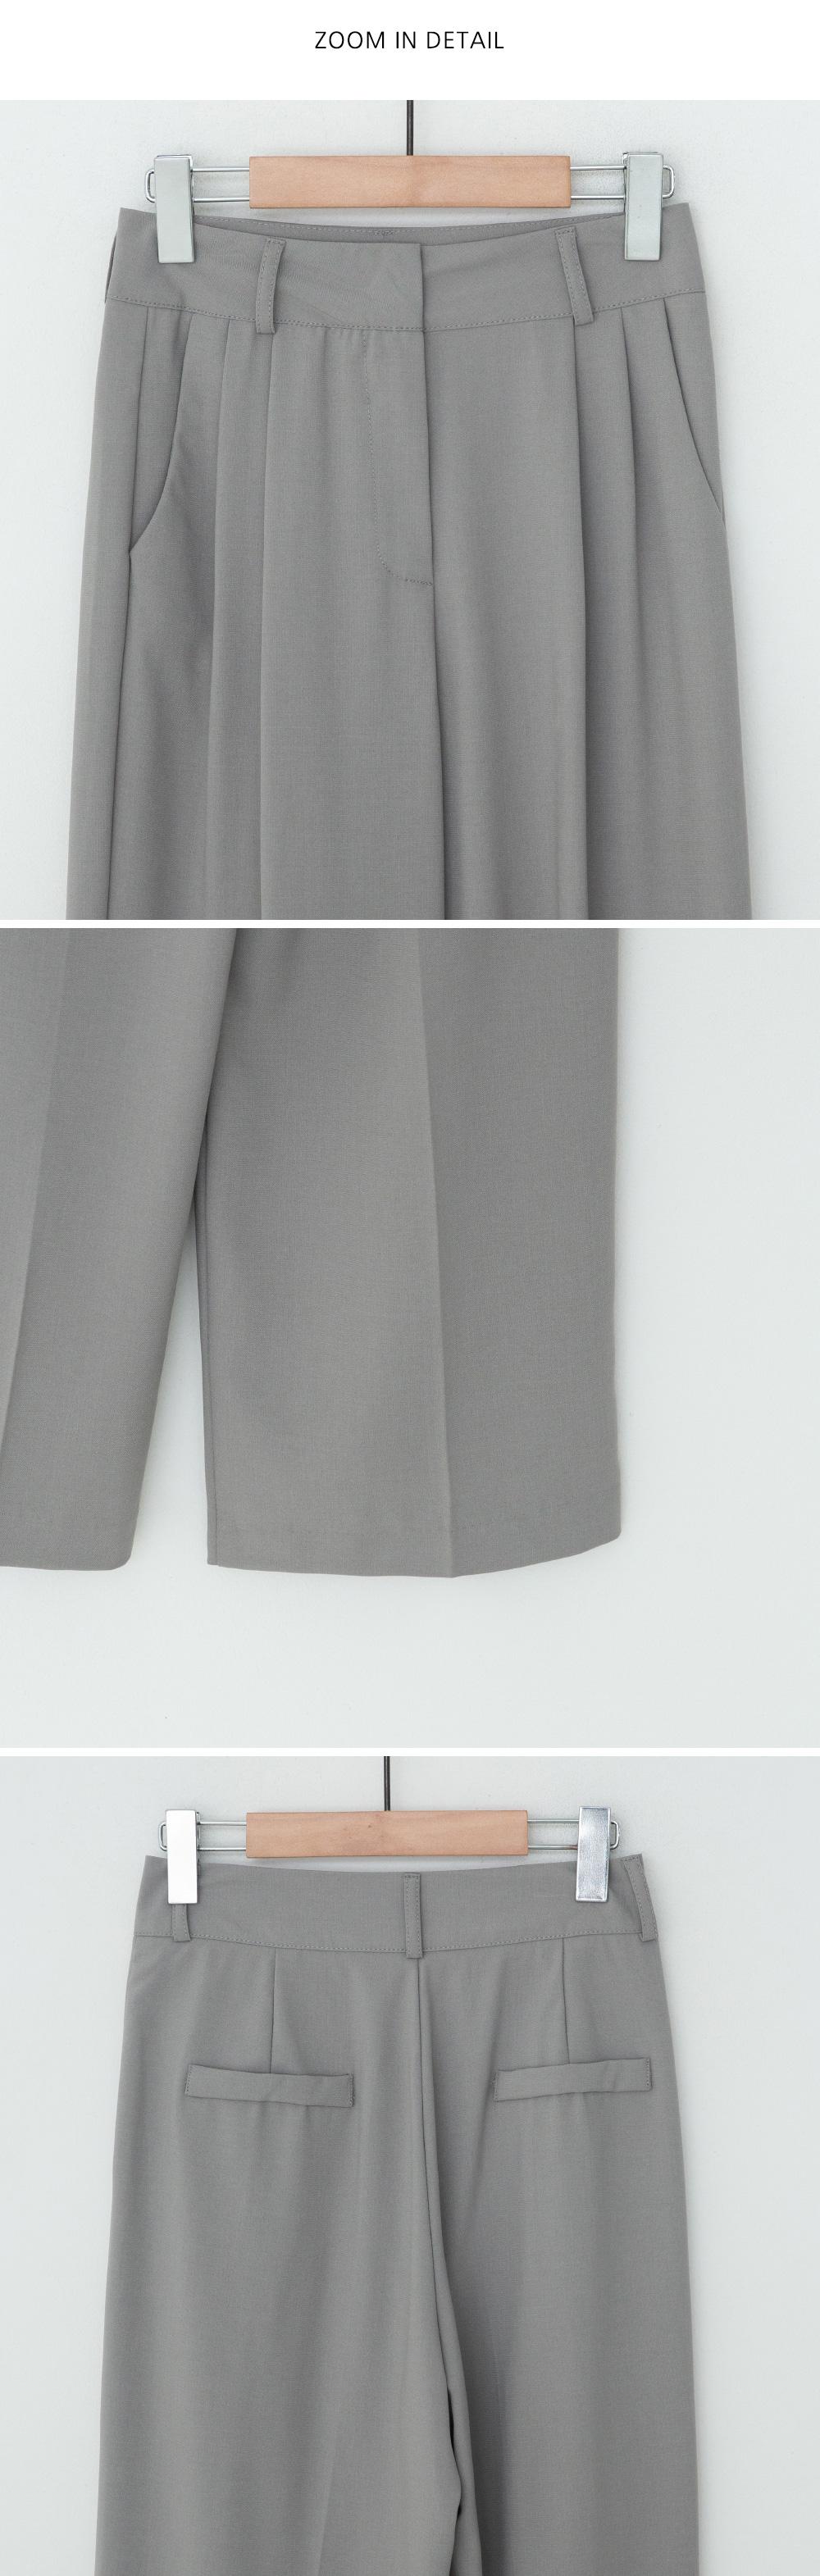 Liya two pin tuck wide slacks